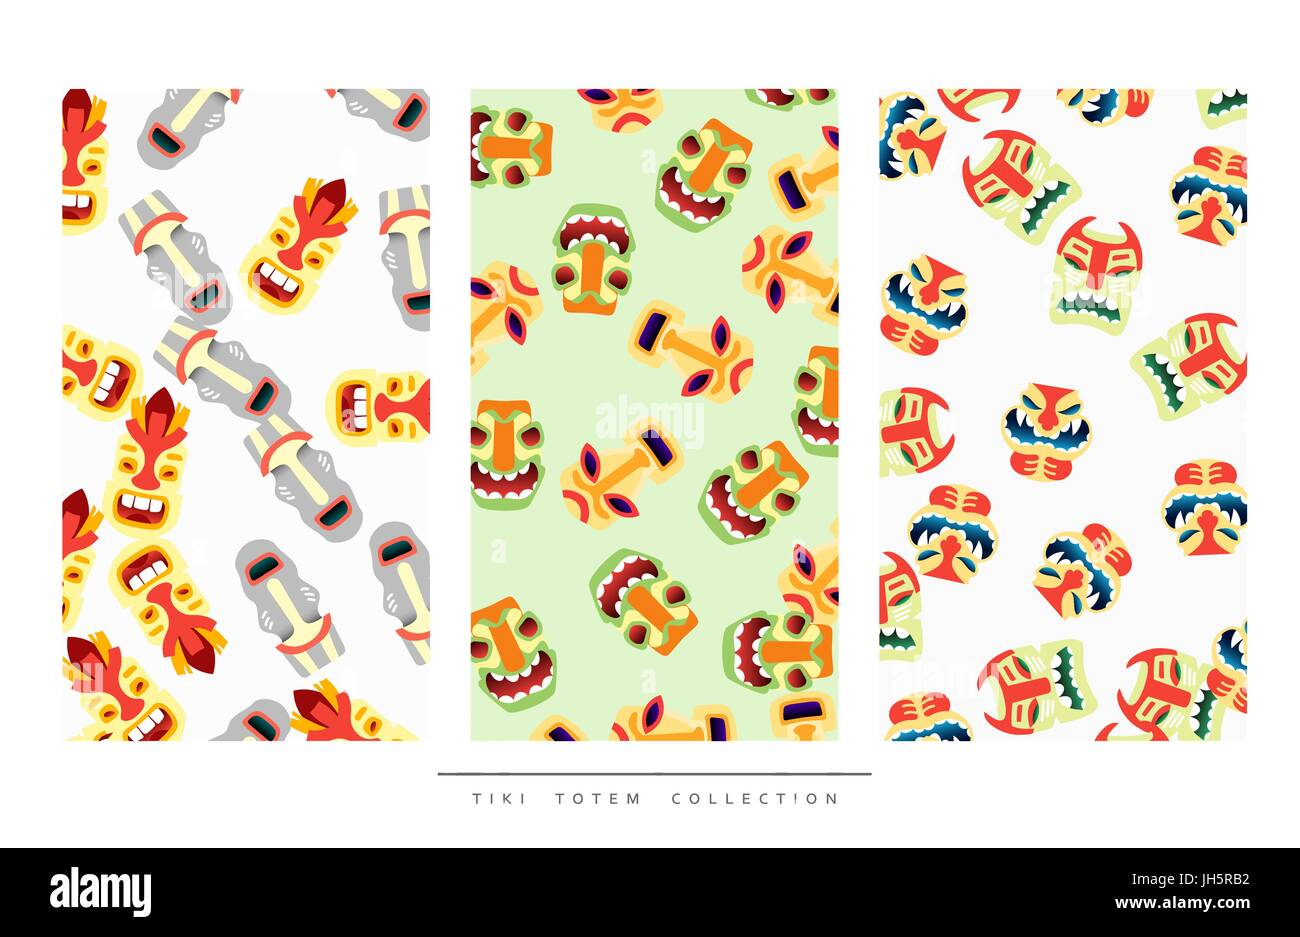 Pattern Tiki Totem in flat style vector illustration - Stock Vector